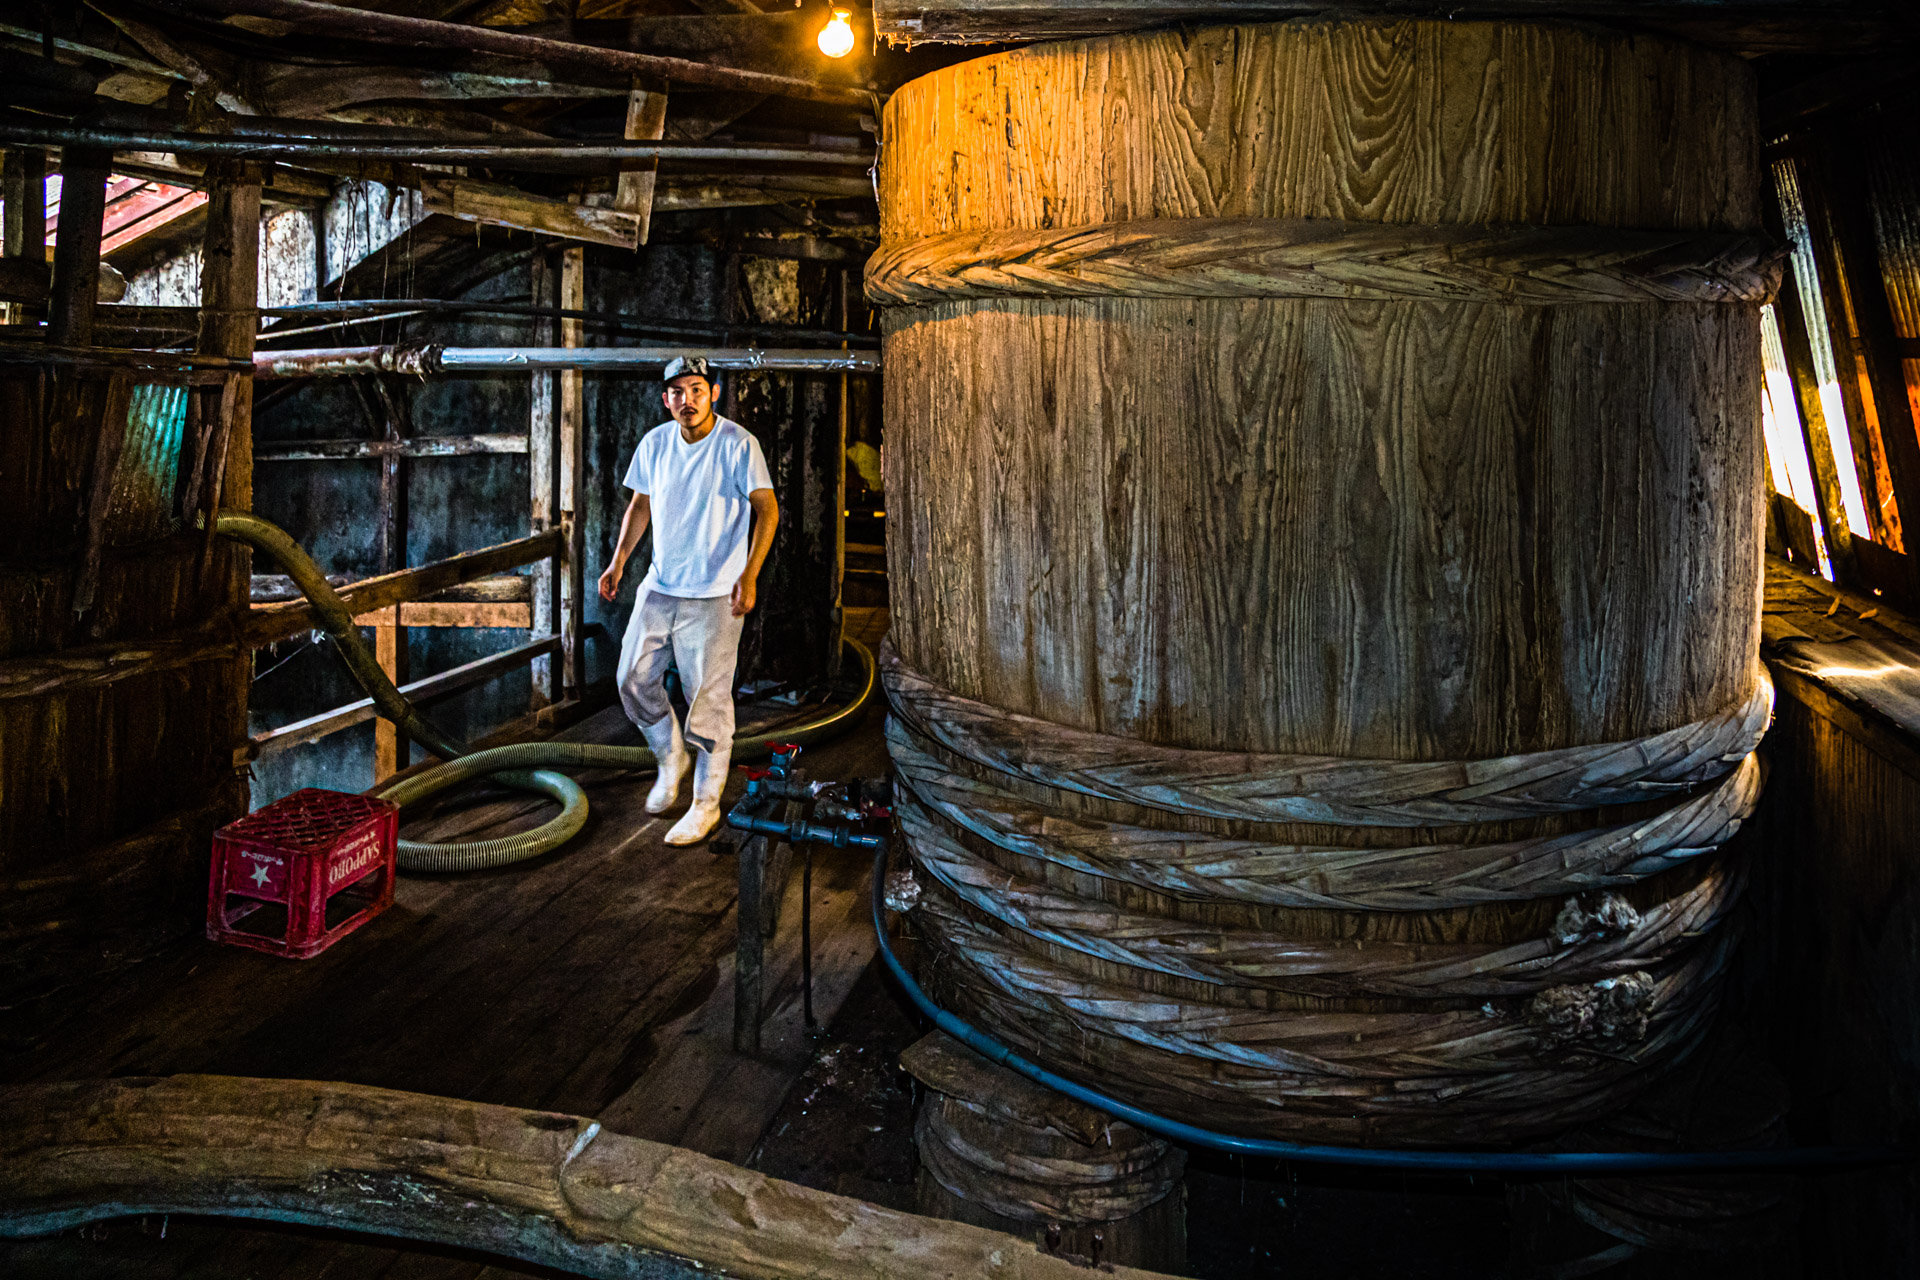 Soy Sause factory in Hamamatsu, Japan